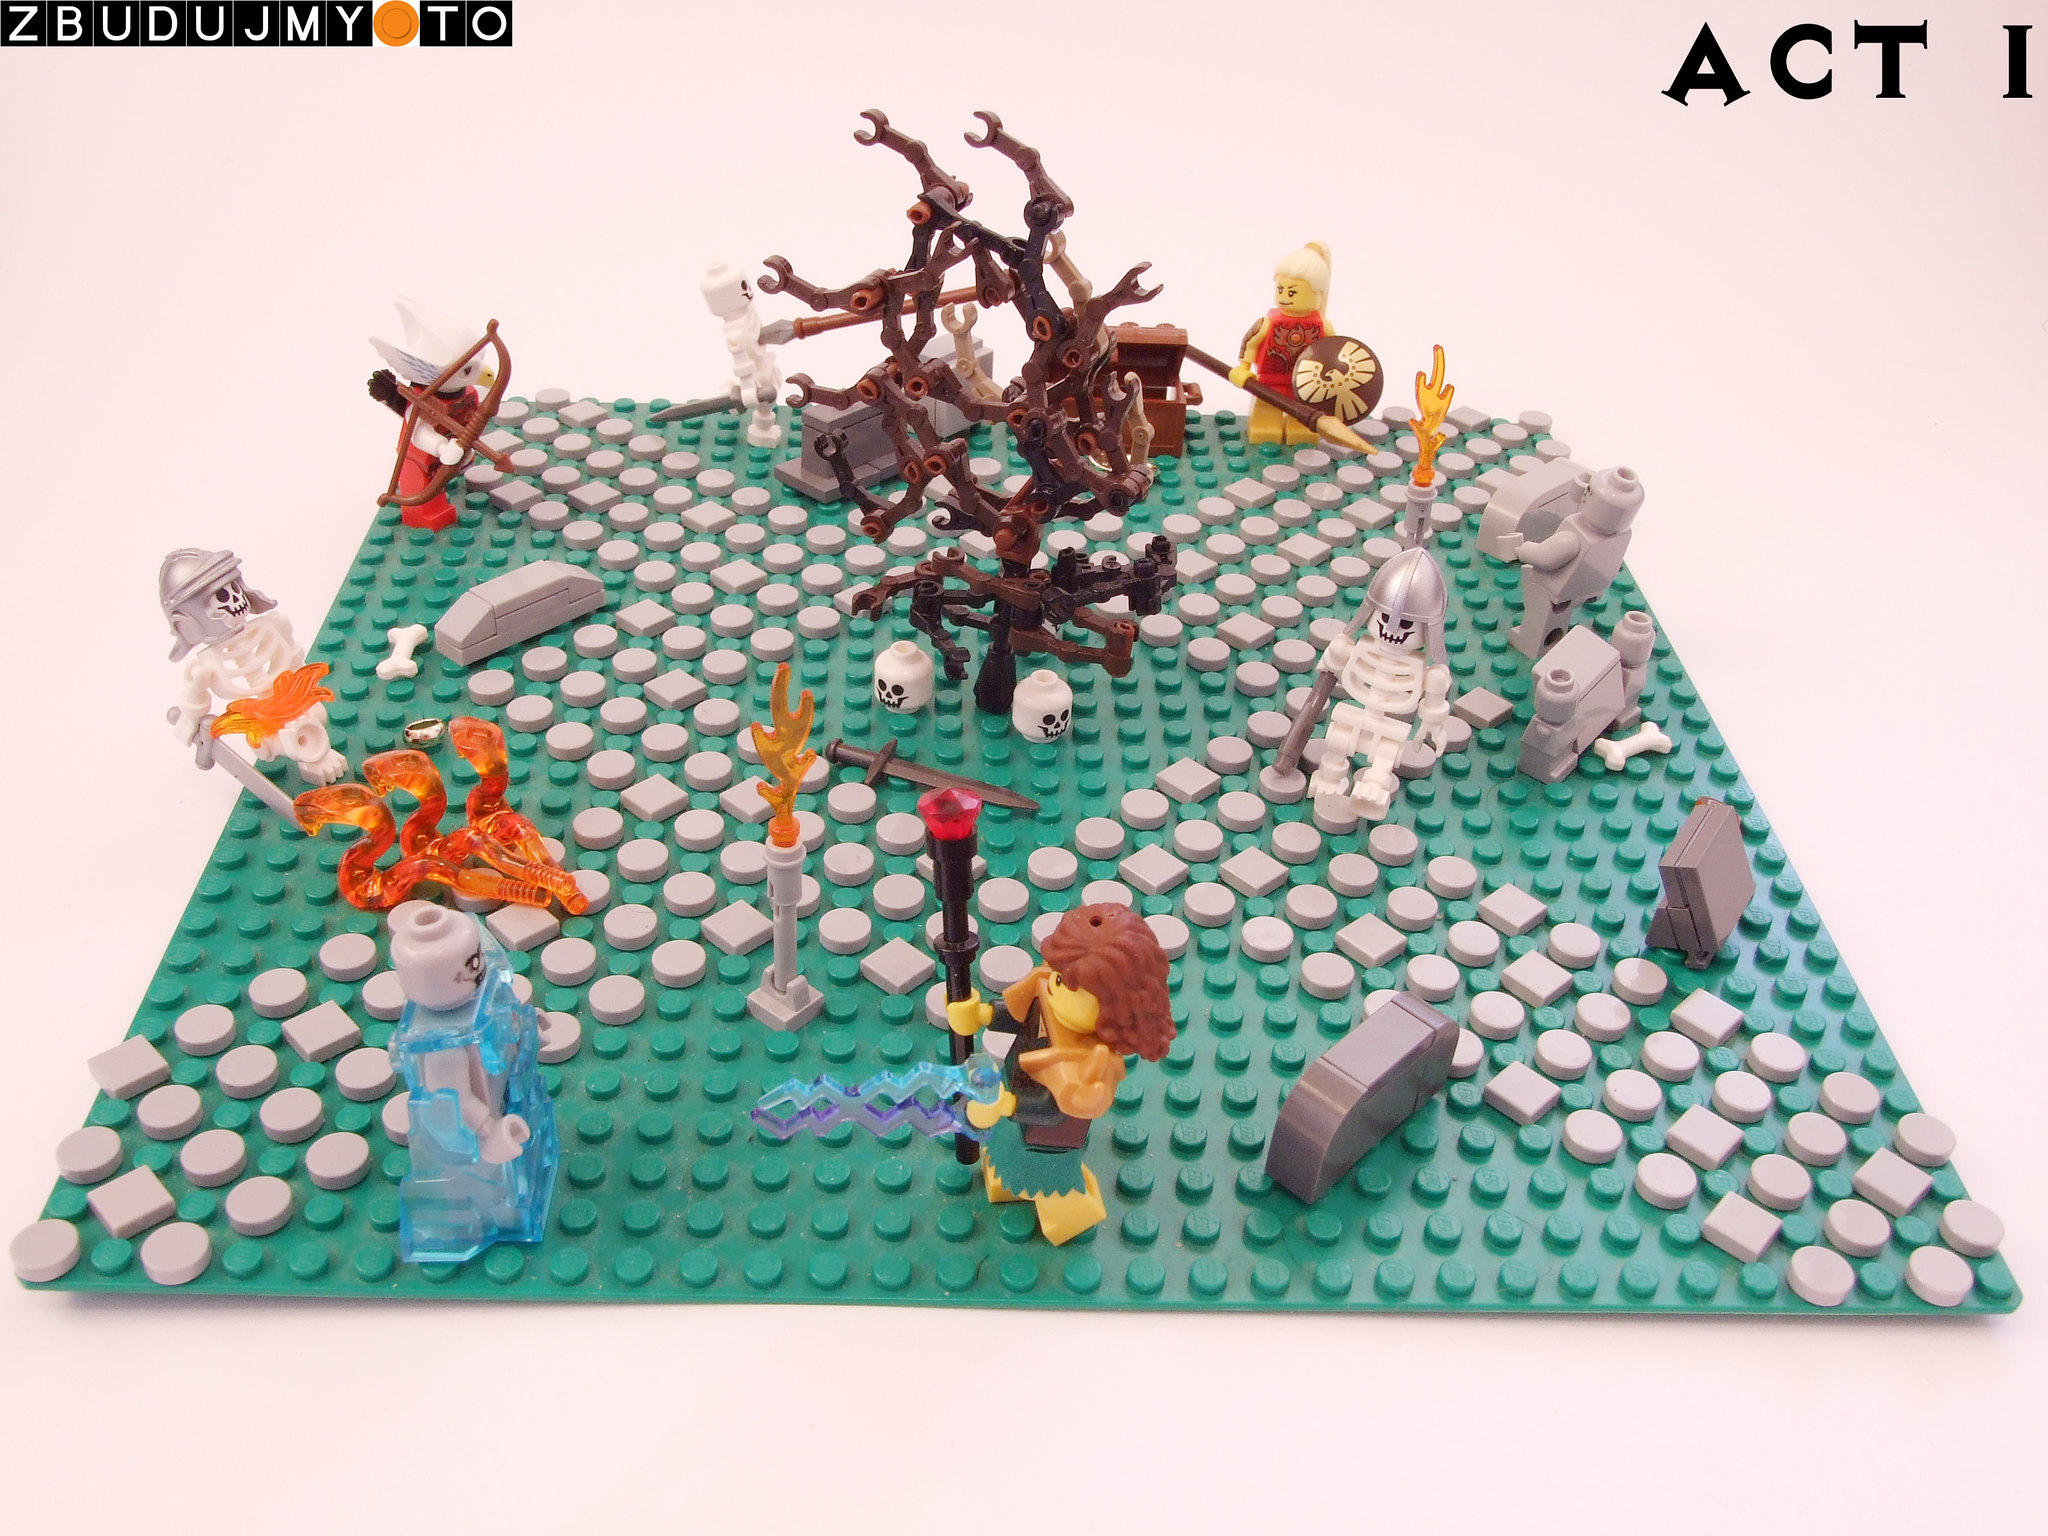 Artist makes LEGO Diablo II figures